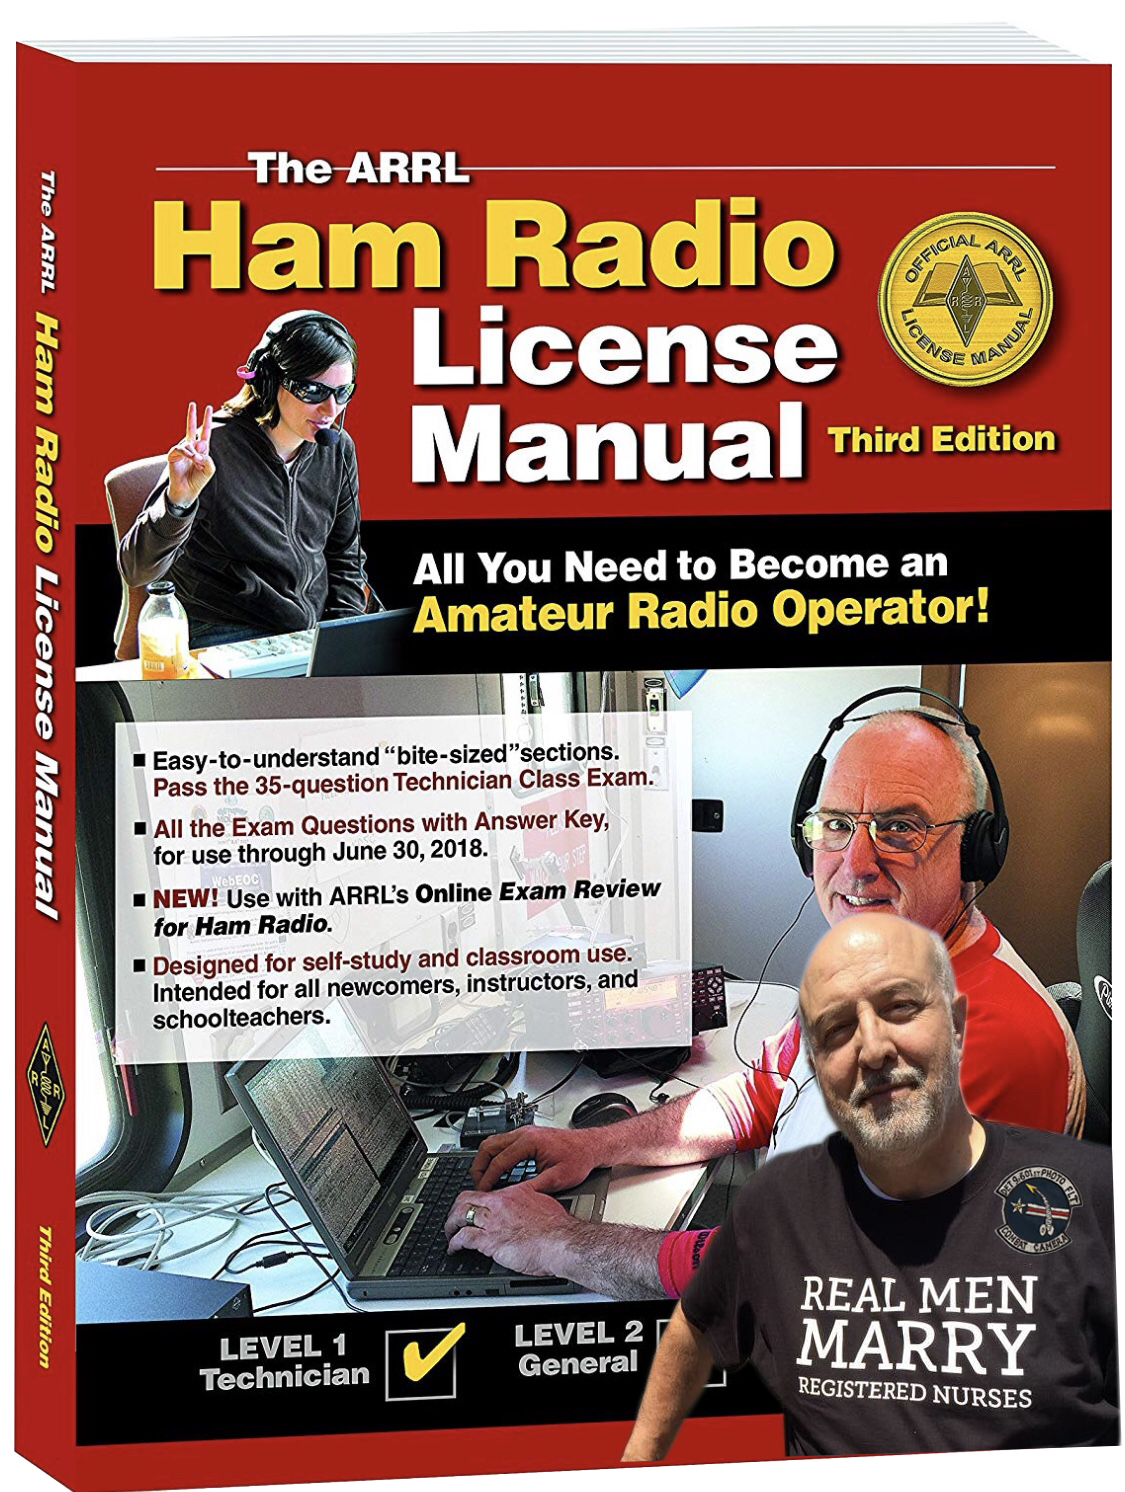 tech-traing-book.png